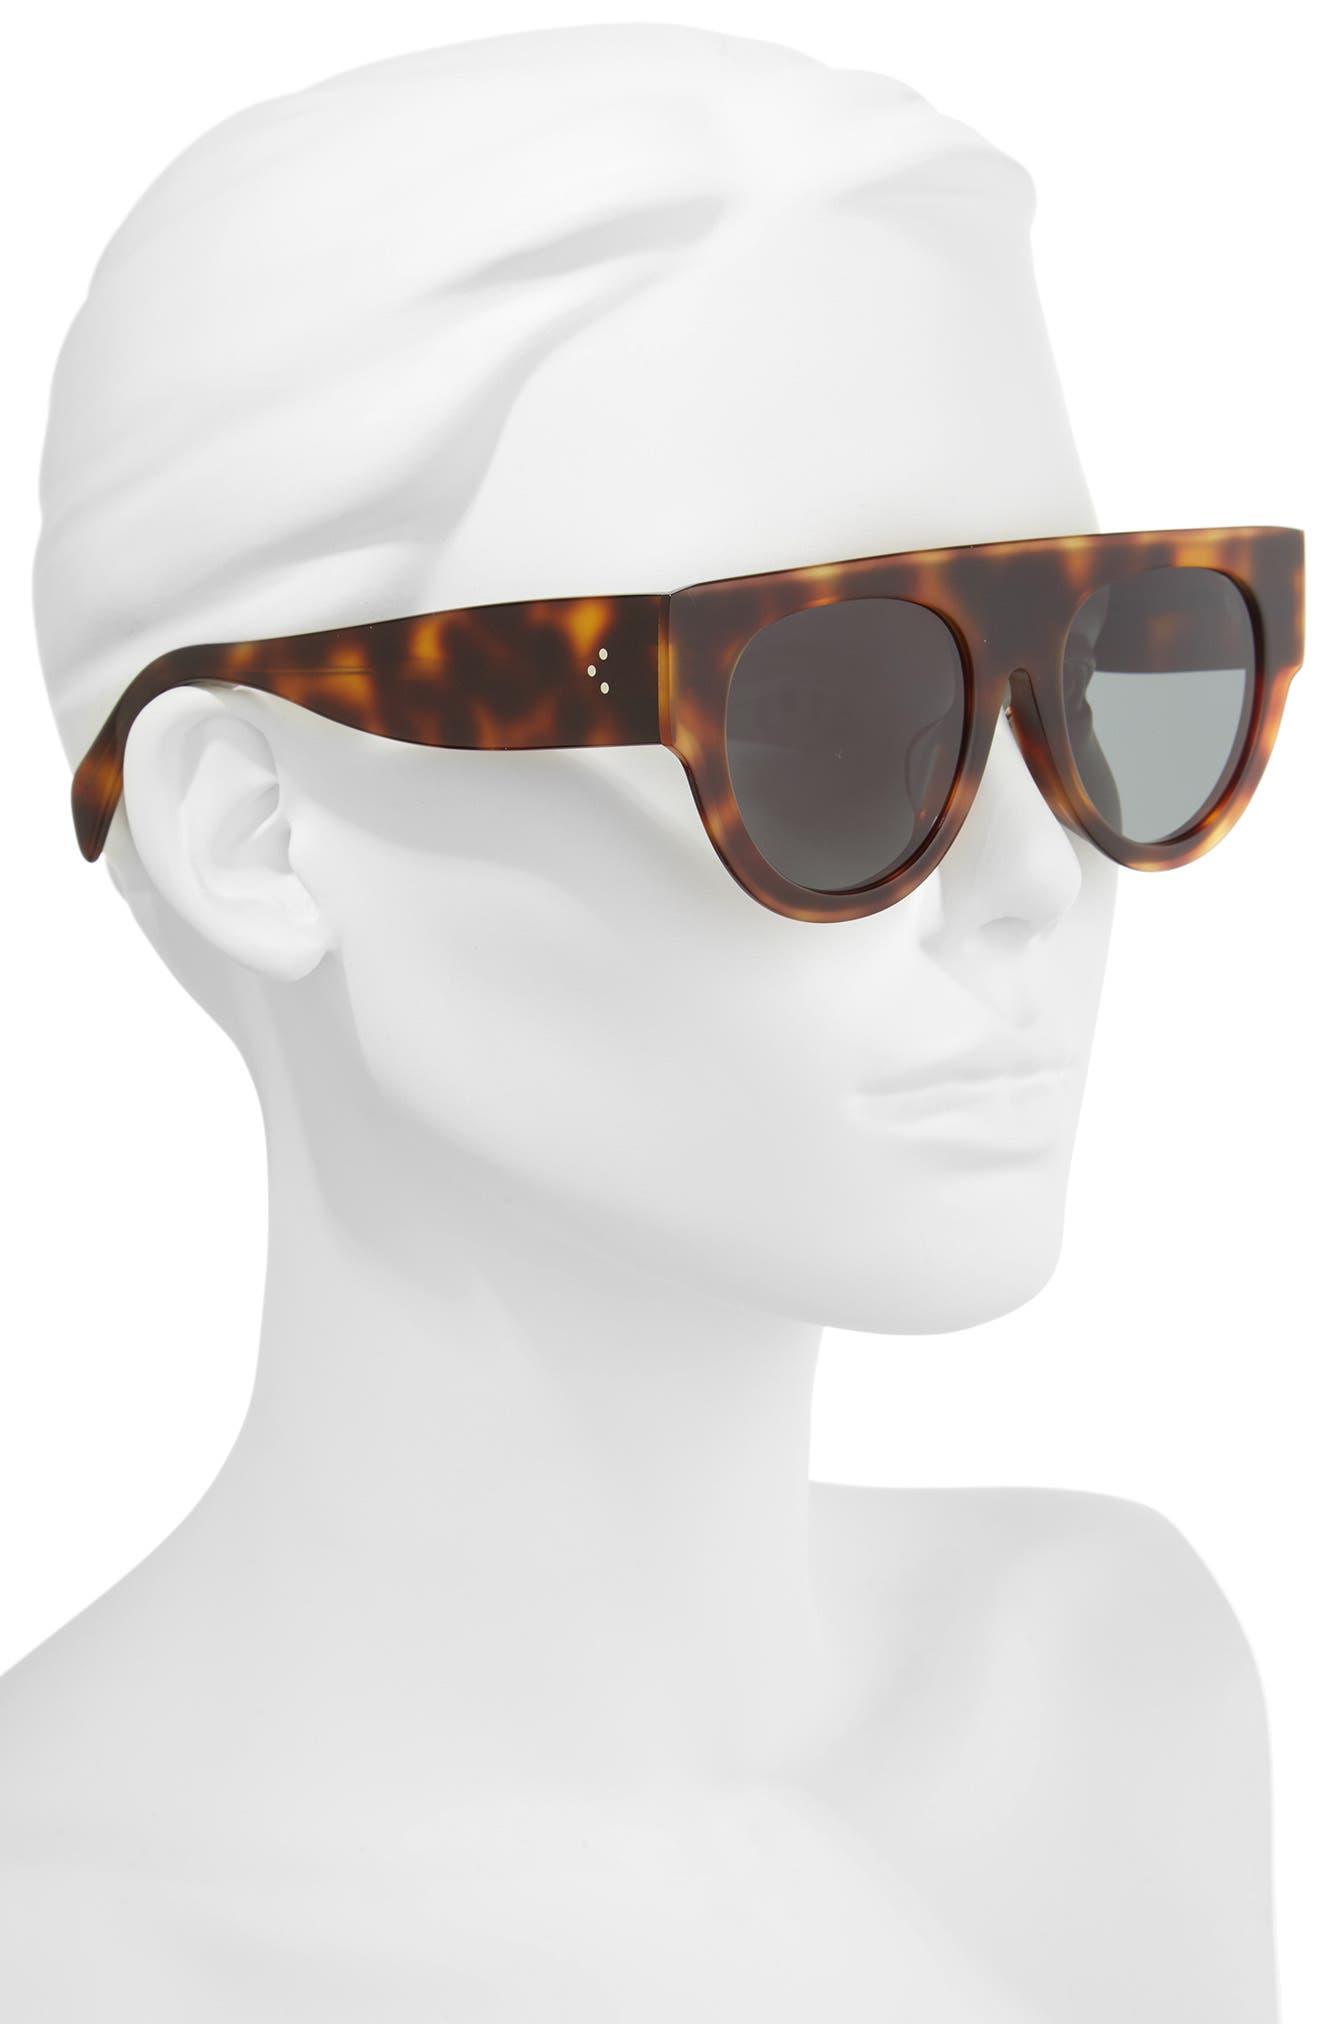 52mm Pilot Sunglasses,                             Alternate thumbnail 2, color,                             Blonde Havana/ Green